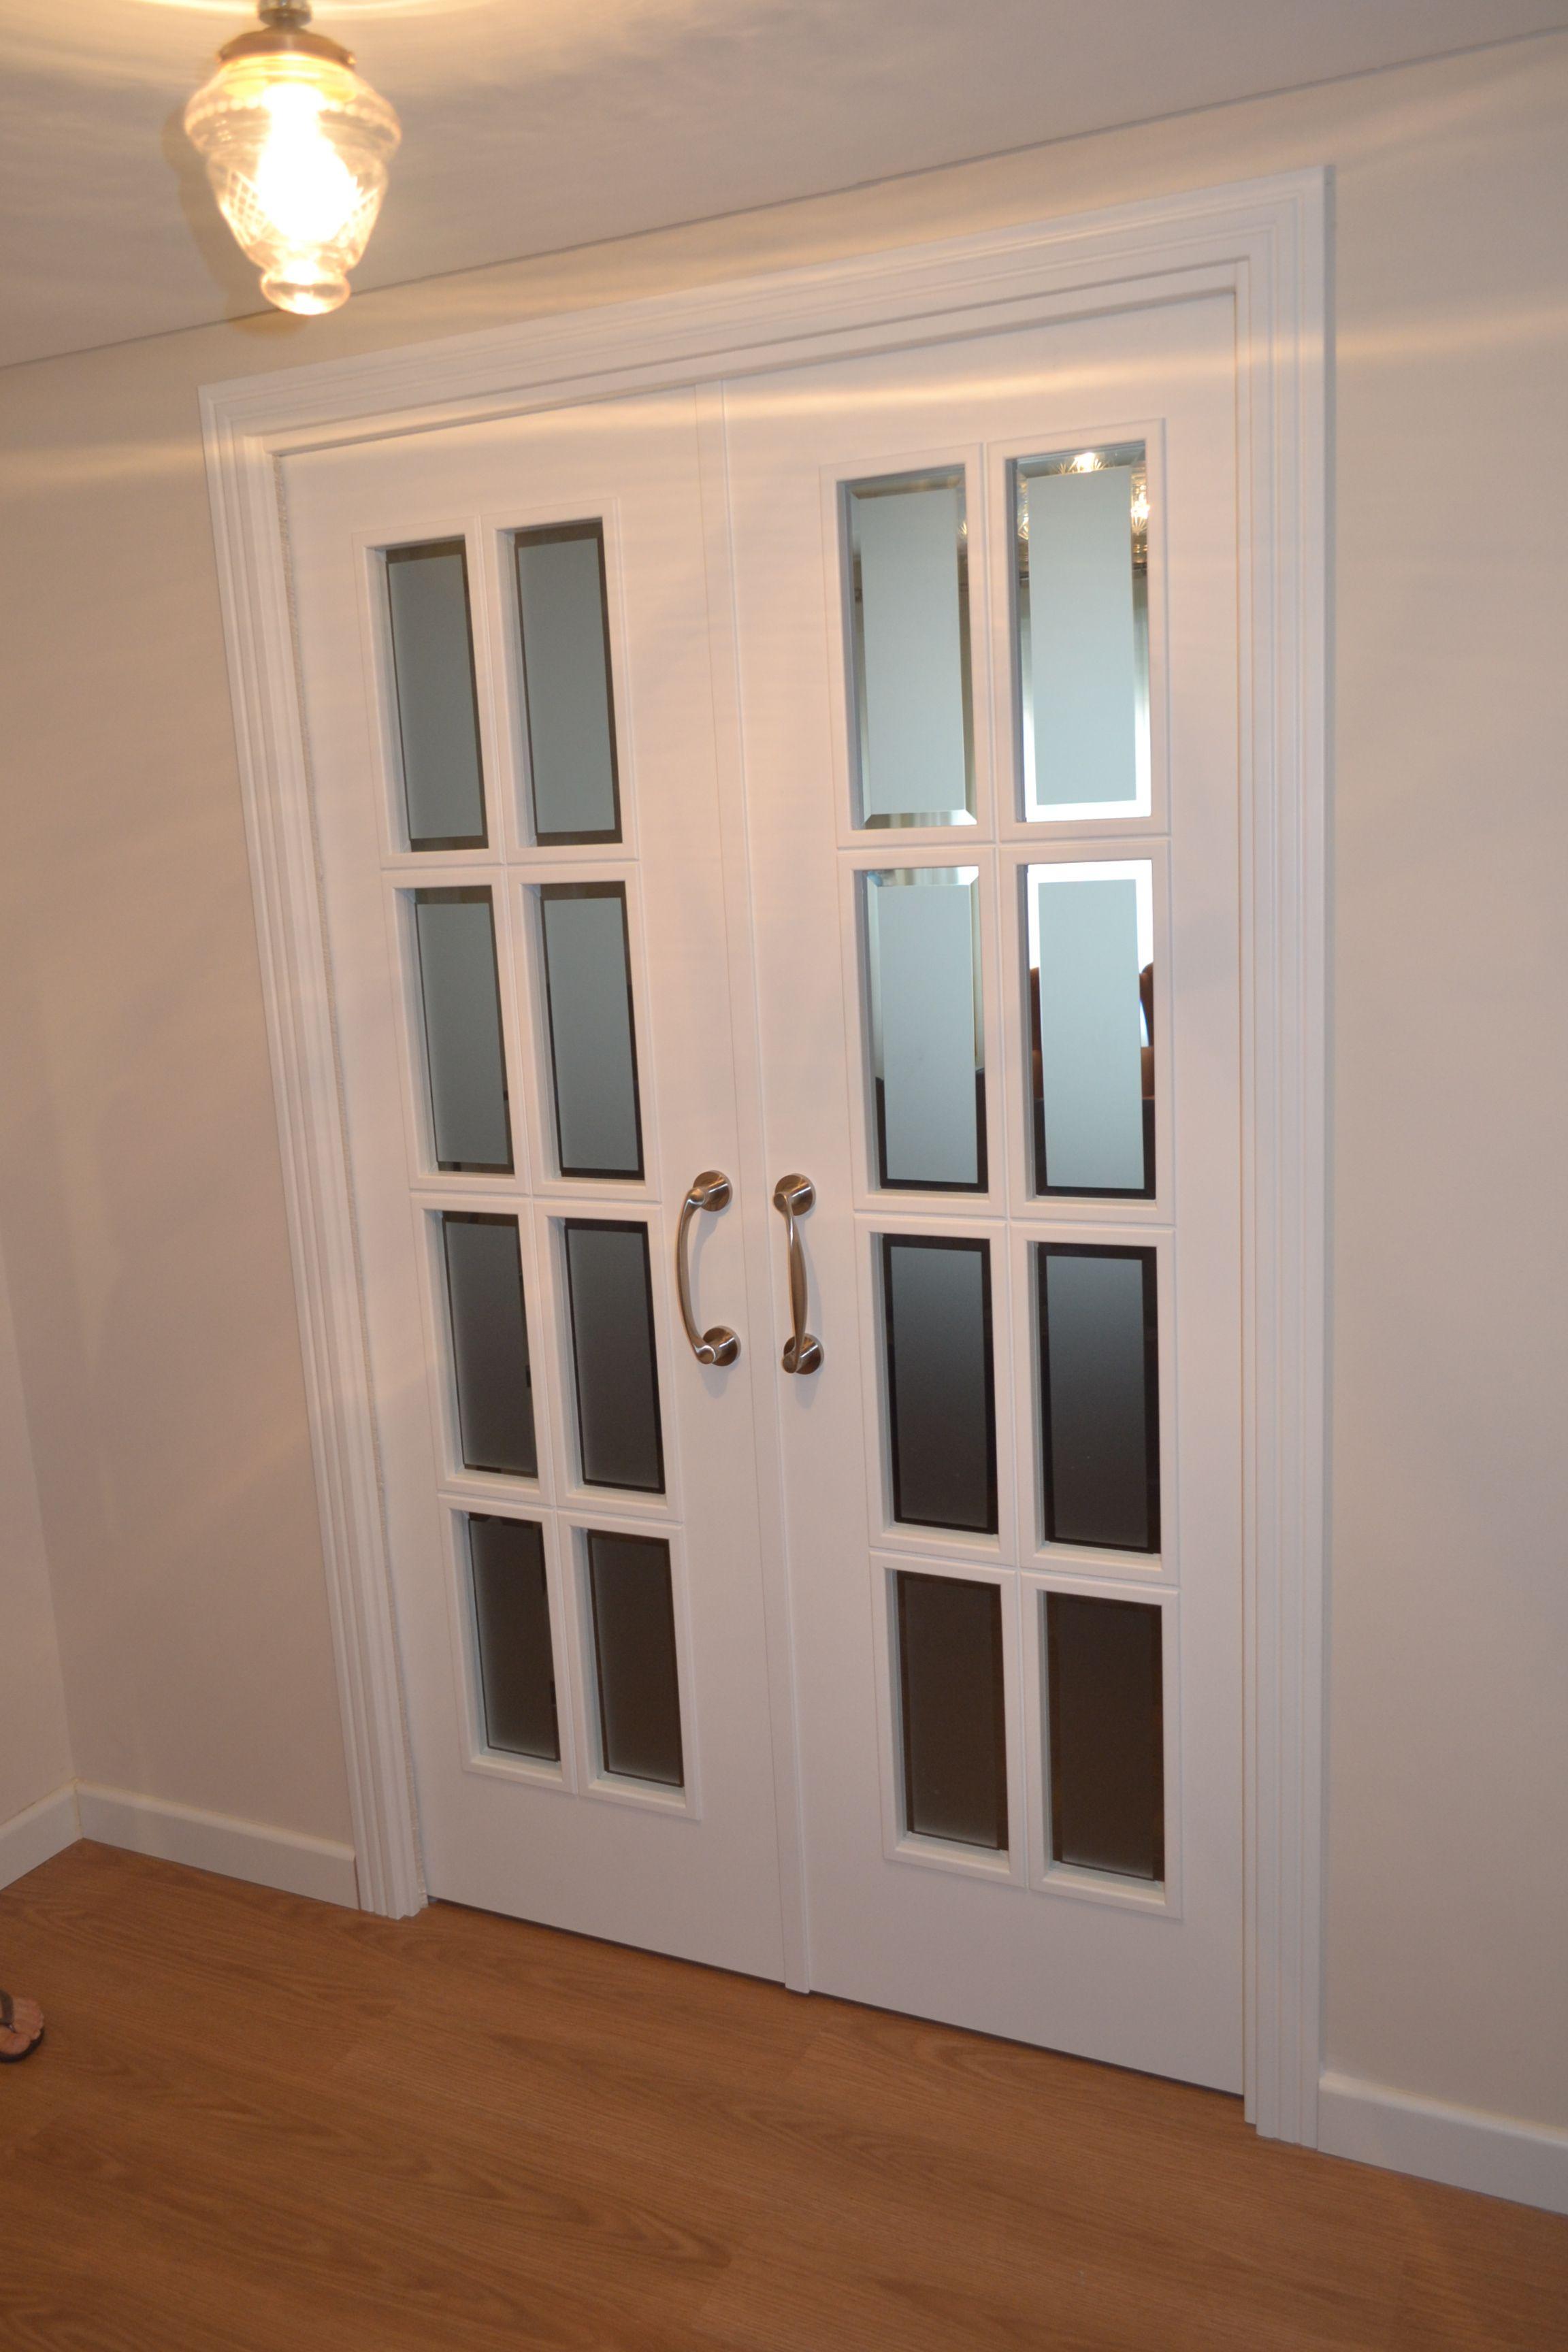 Dise o de puerta interior en sal n de hogar puertas for Disenos de puertas para interiores